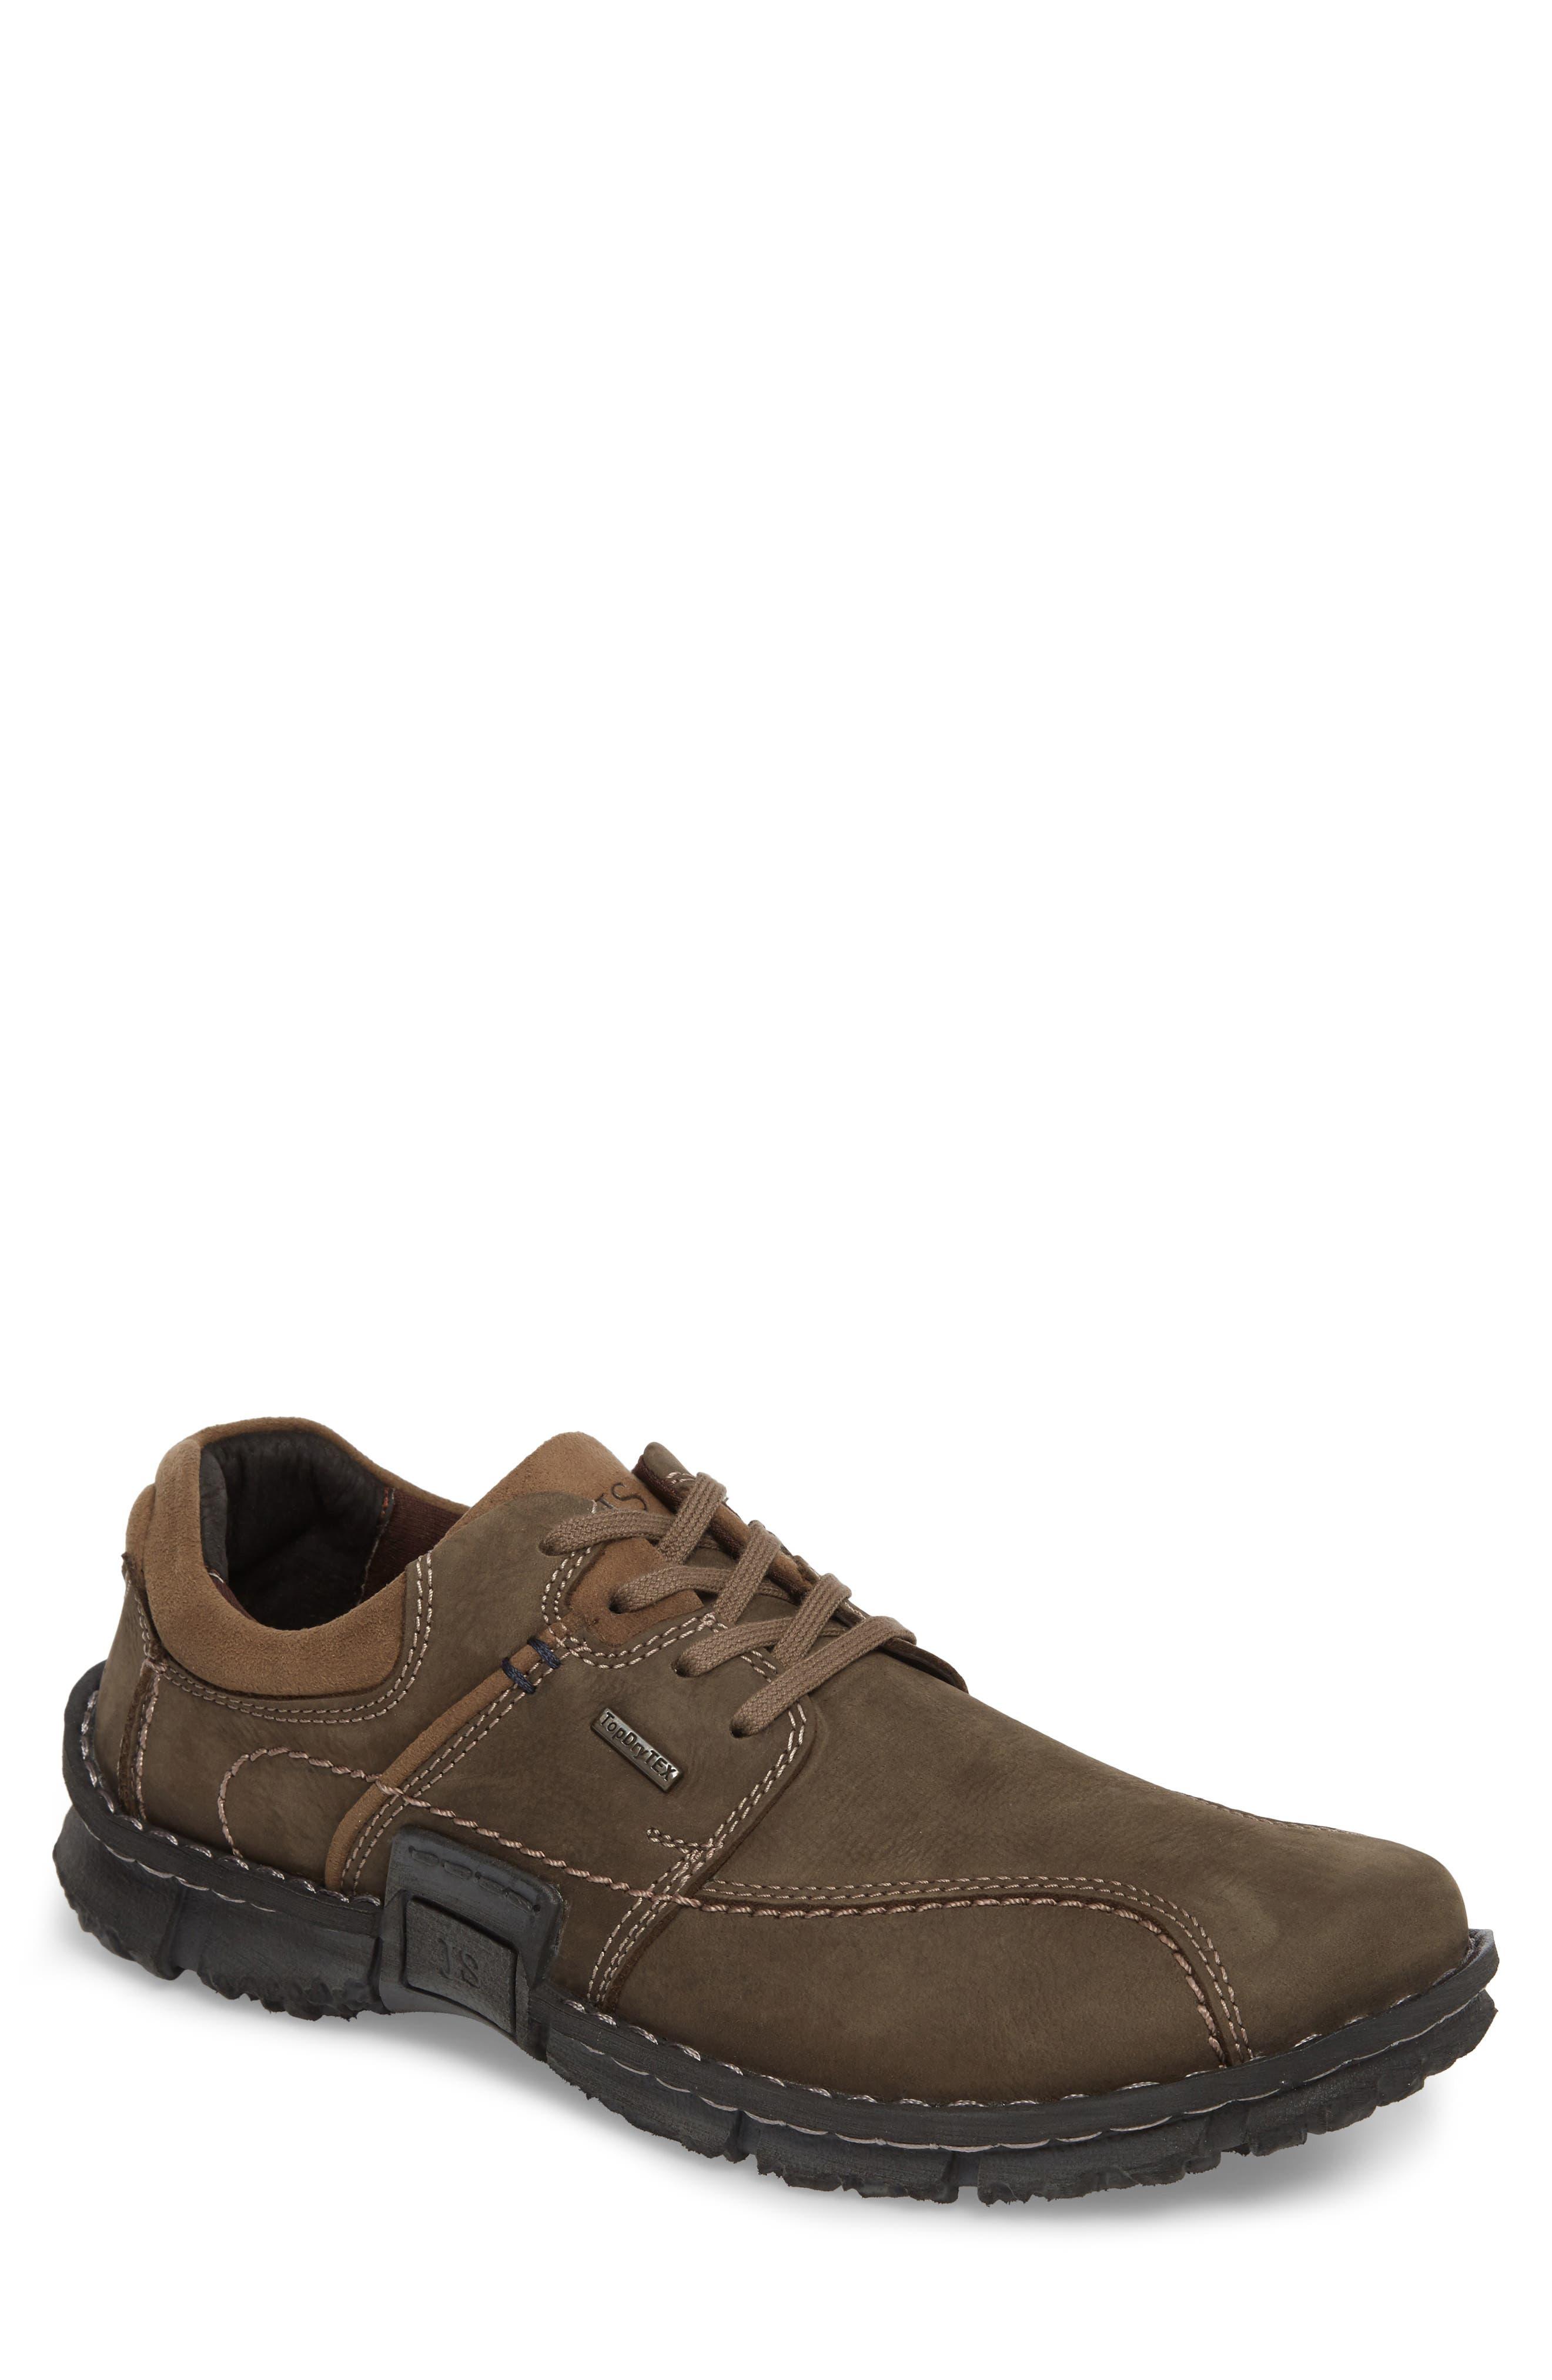 Alternate Image 1 Selected - Josef Seibel Willow Waterproof Sneaker (Men)